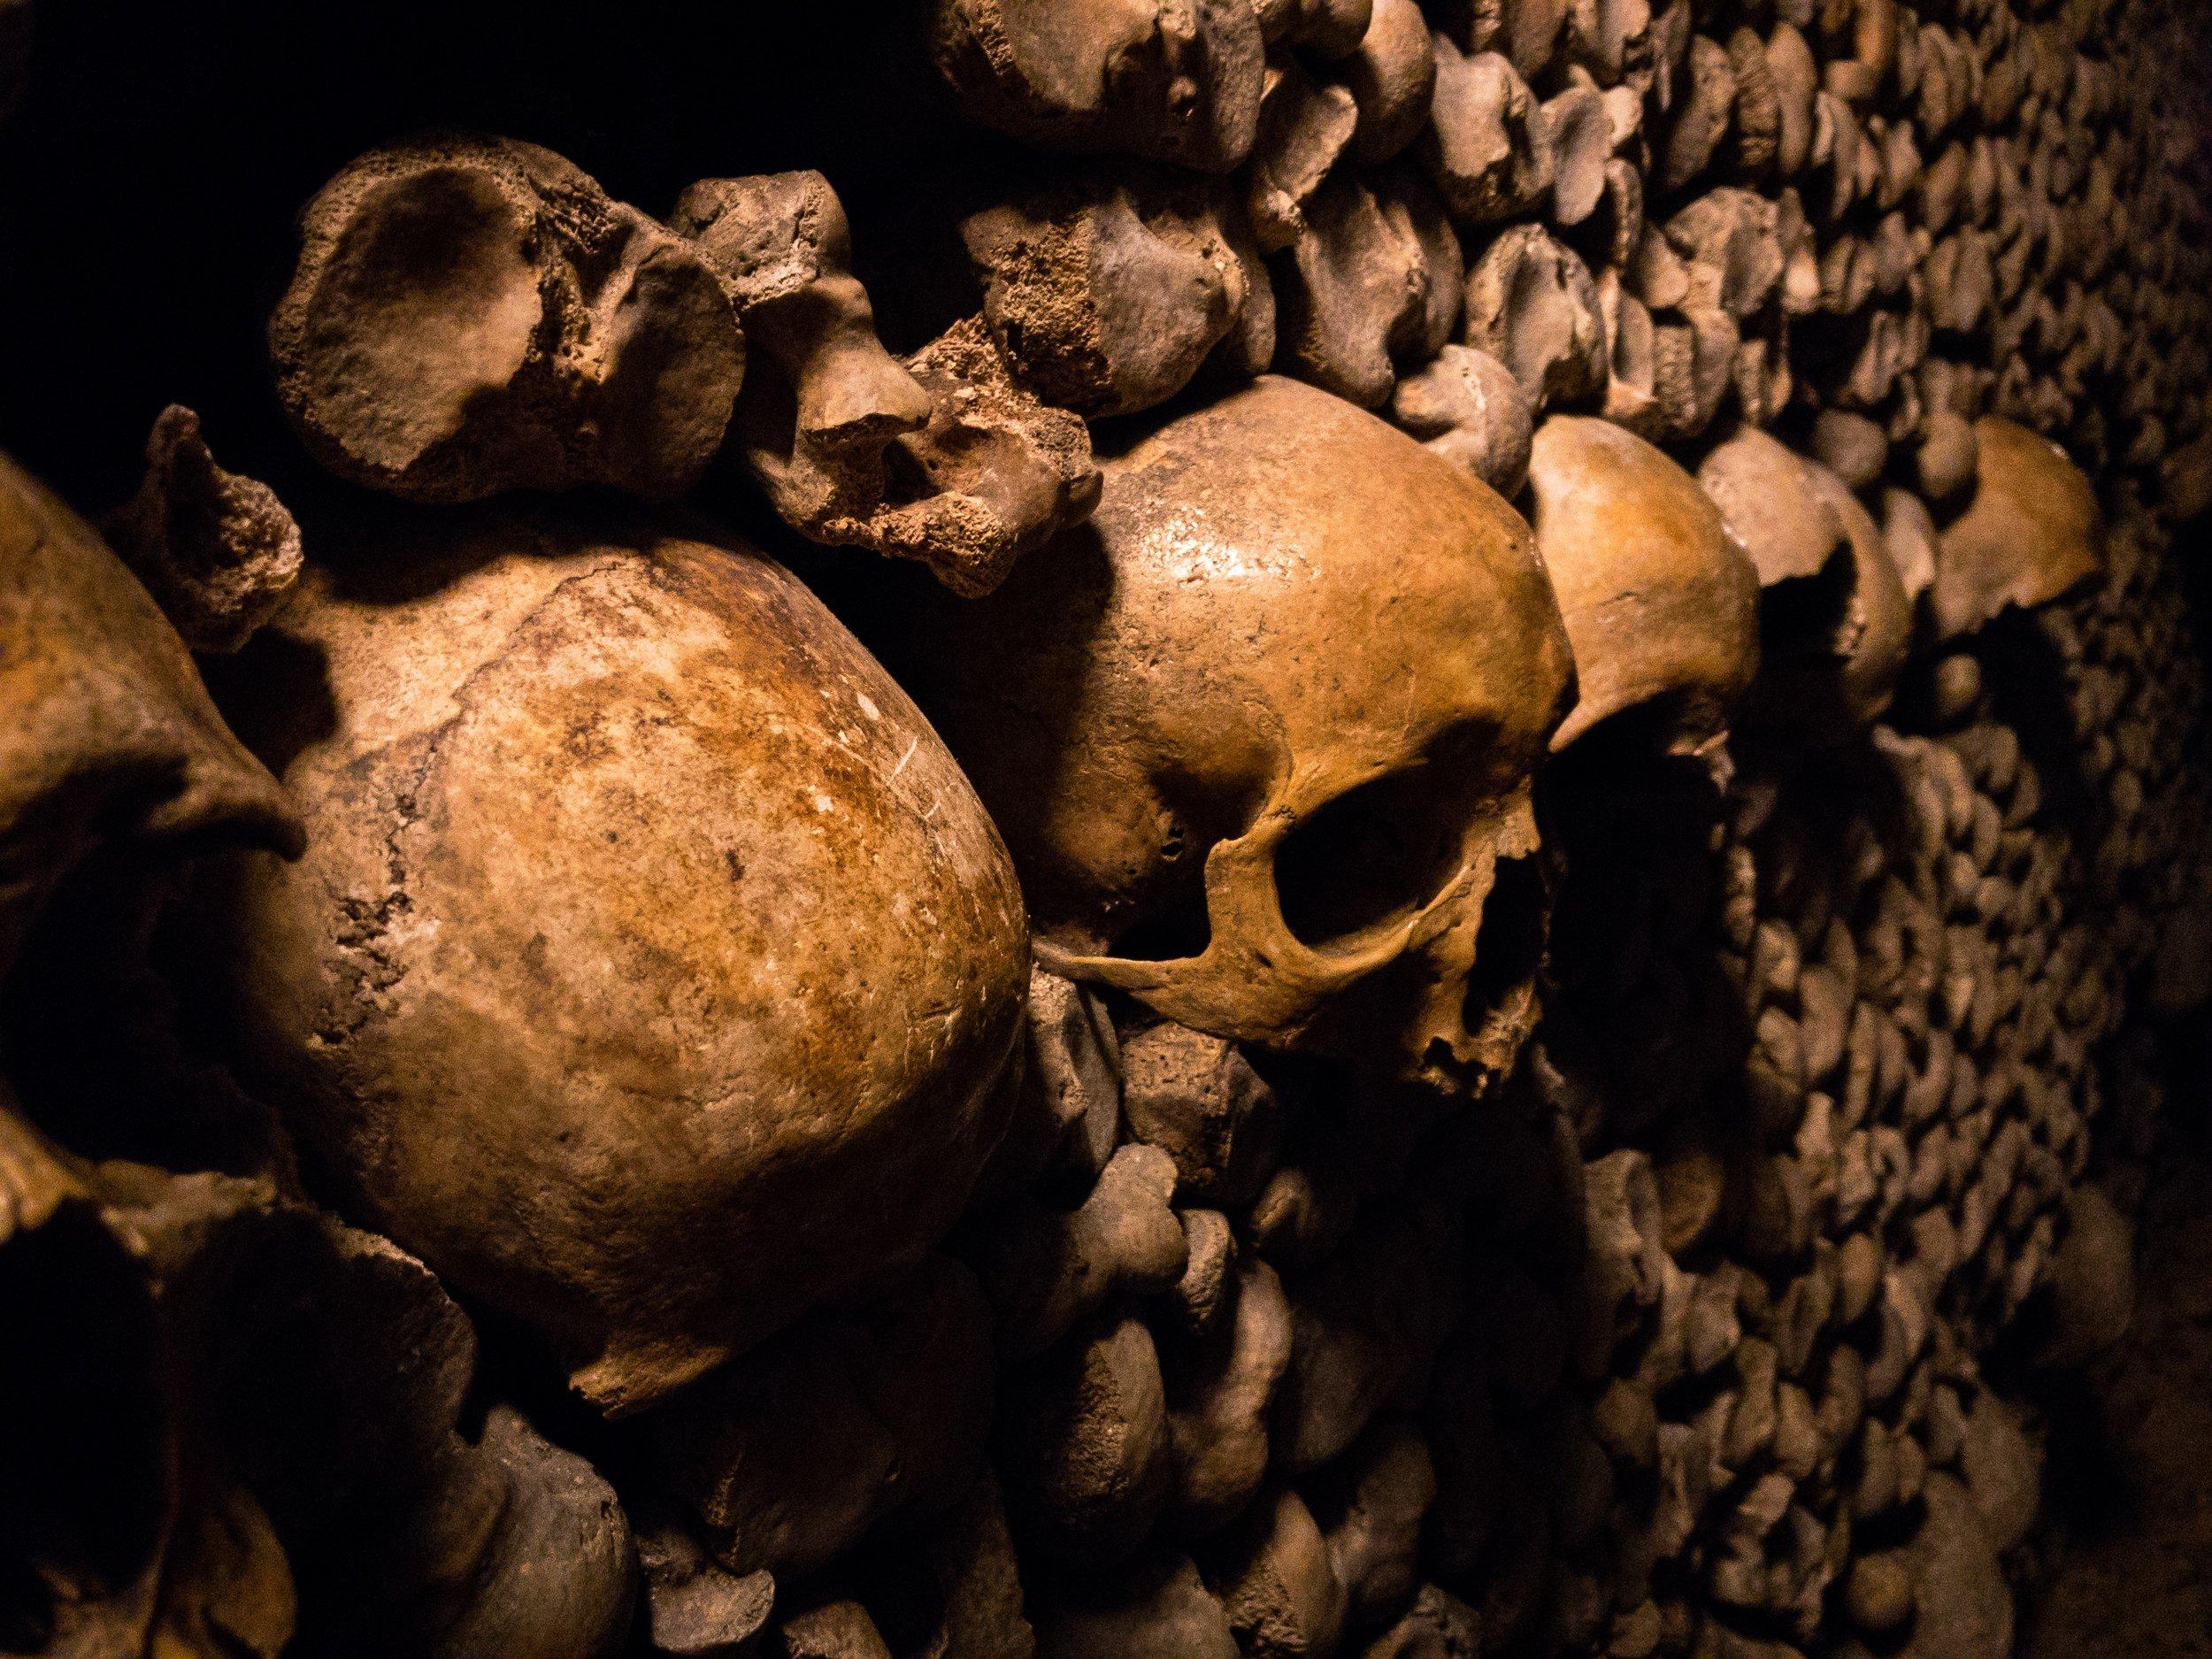 Sklep - הוא מבנה קבורה ברוסית. המקום בו הנפש מועצמת